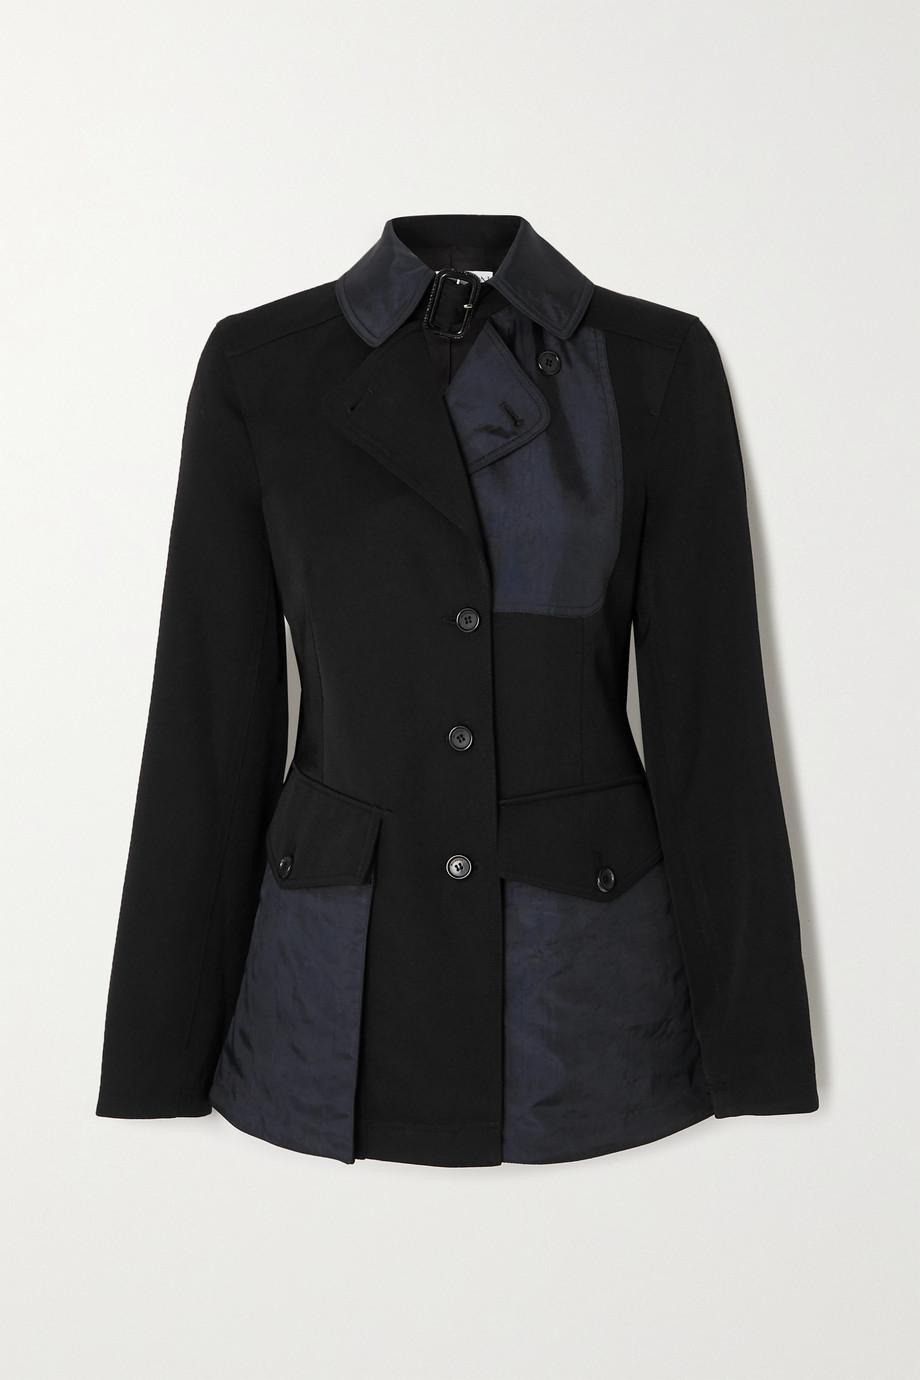 JW Anderson Shell-paneled wool jacket